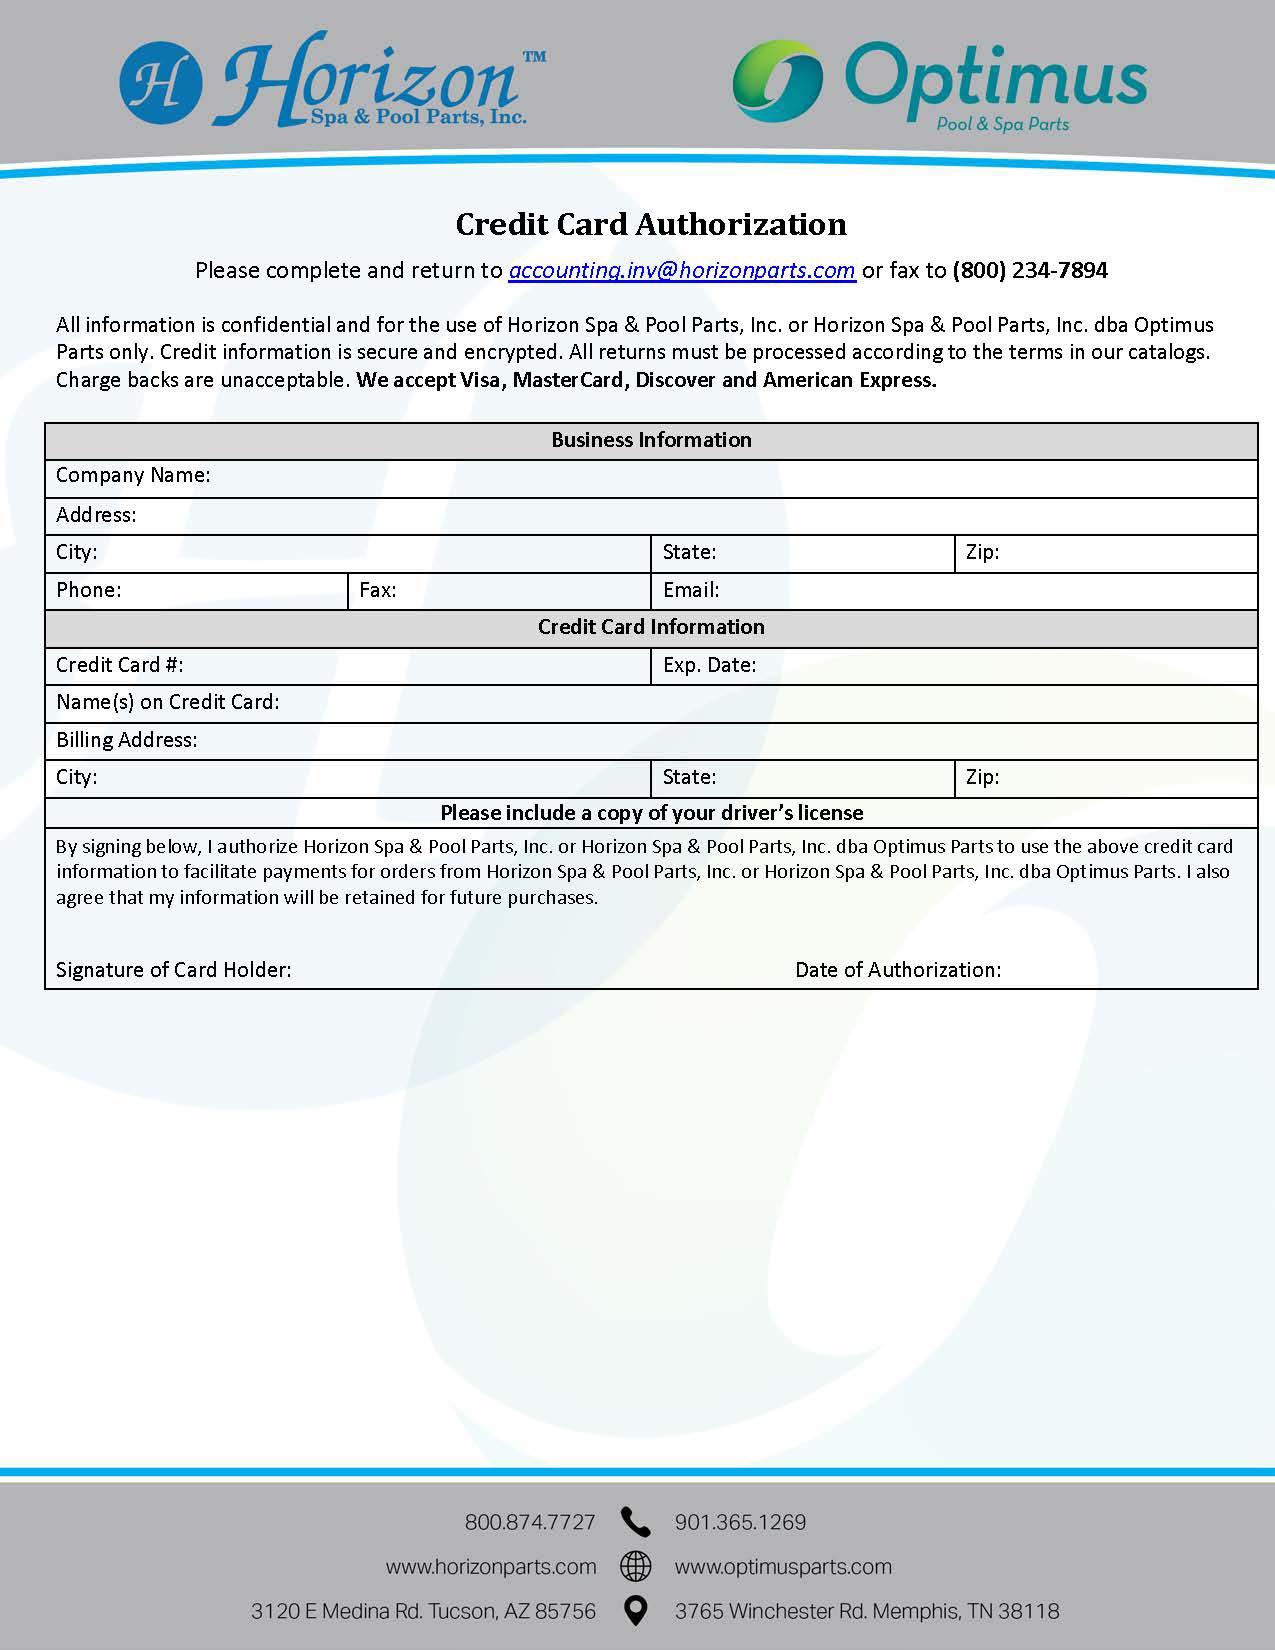 horizon spa pool parts inc credit card authorization form